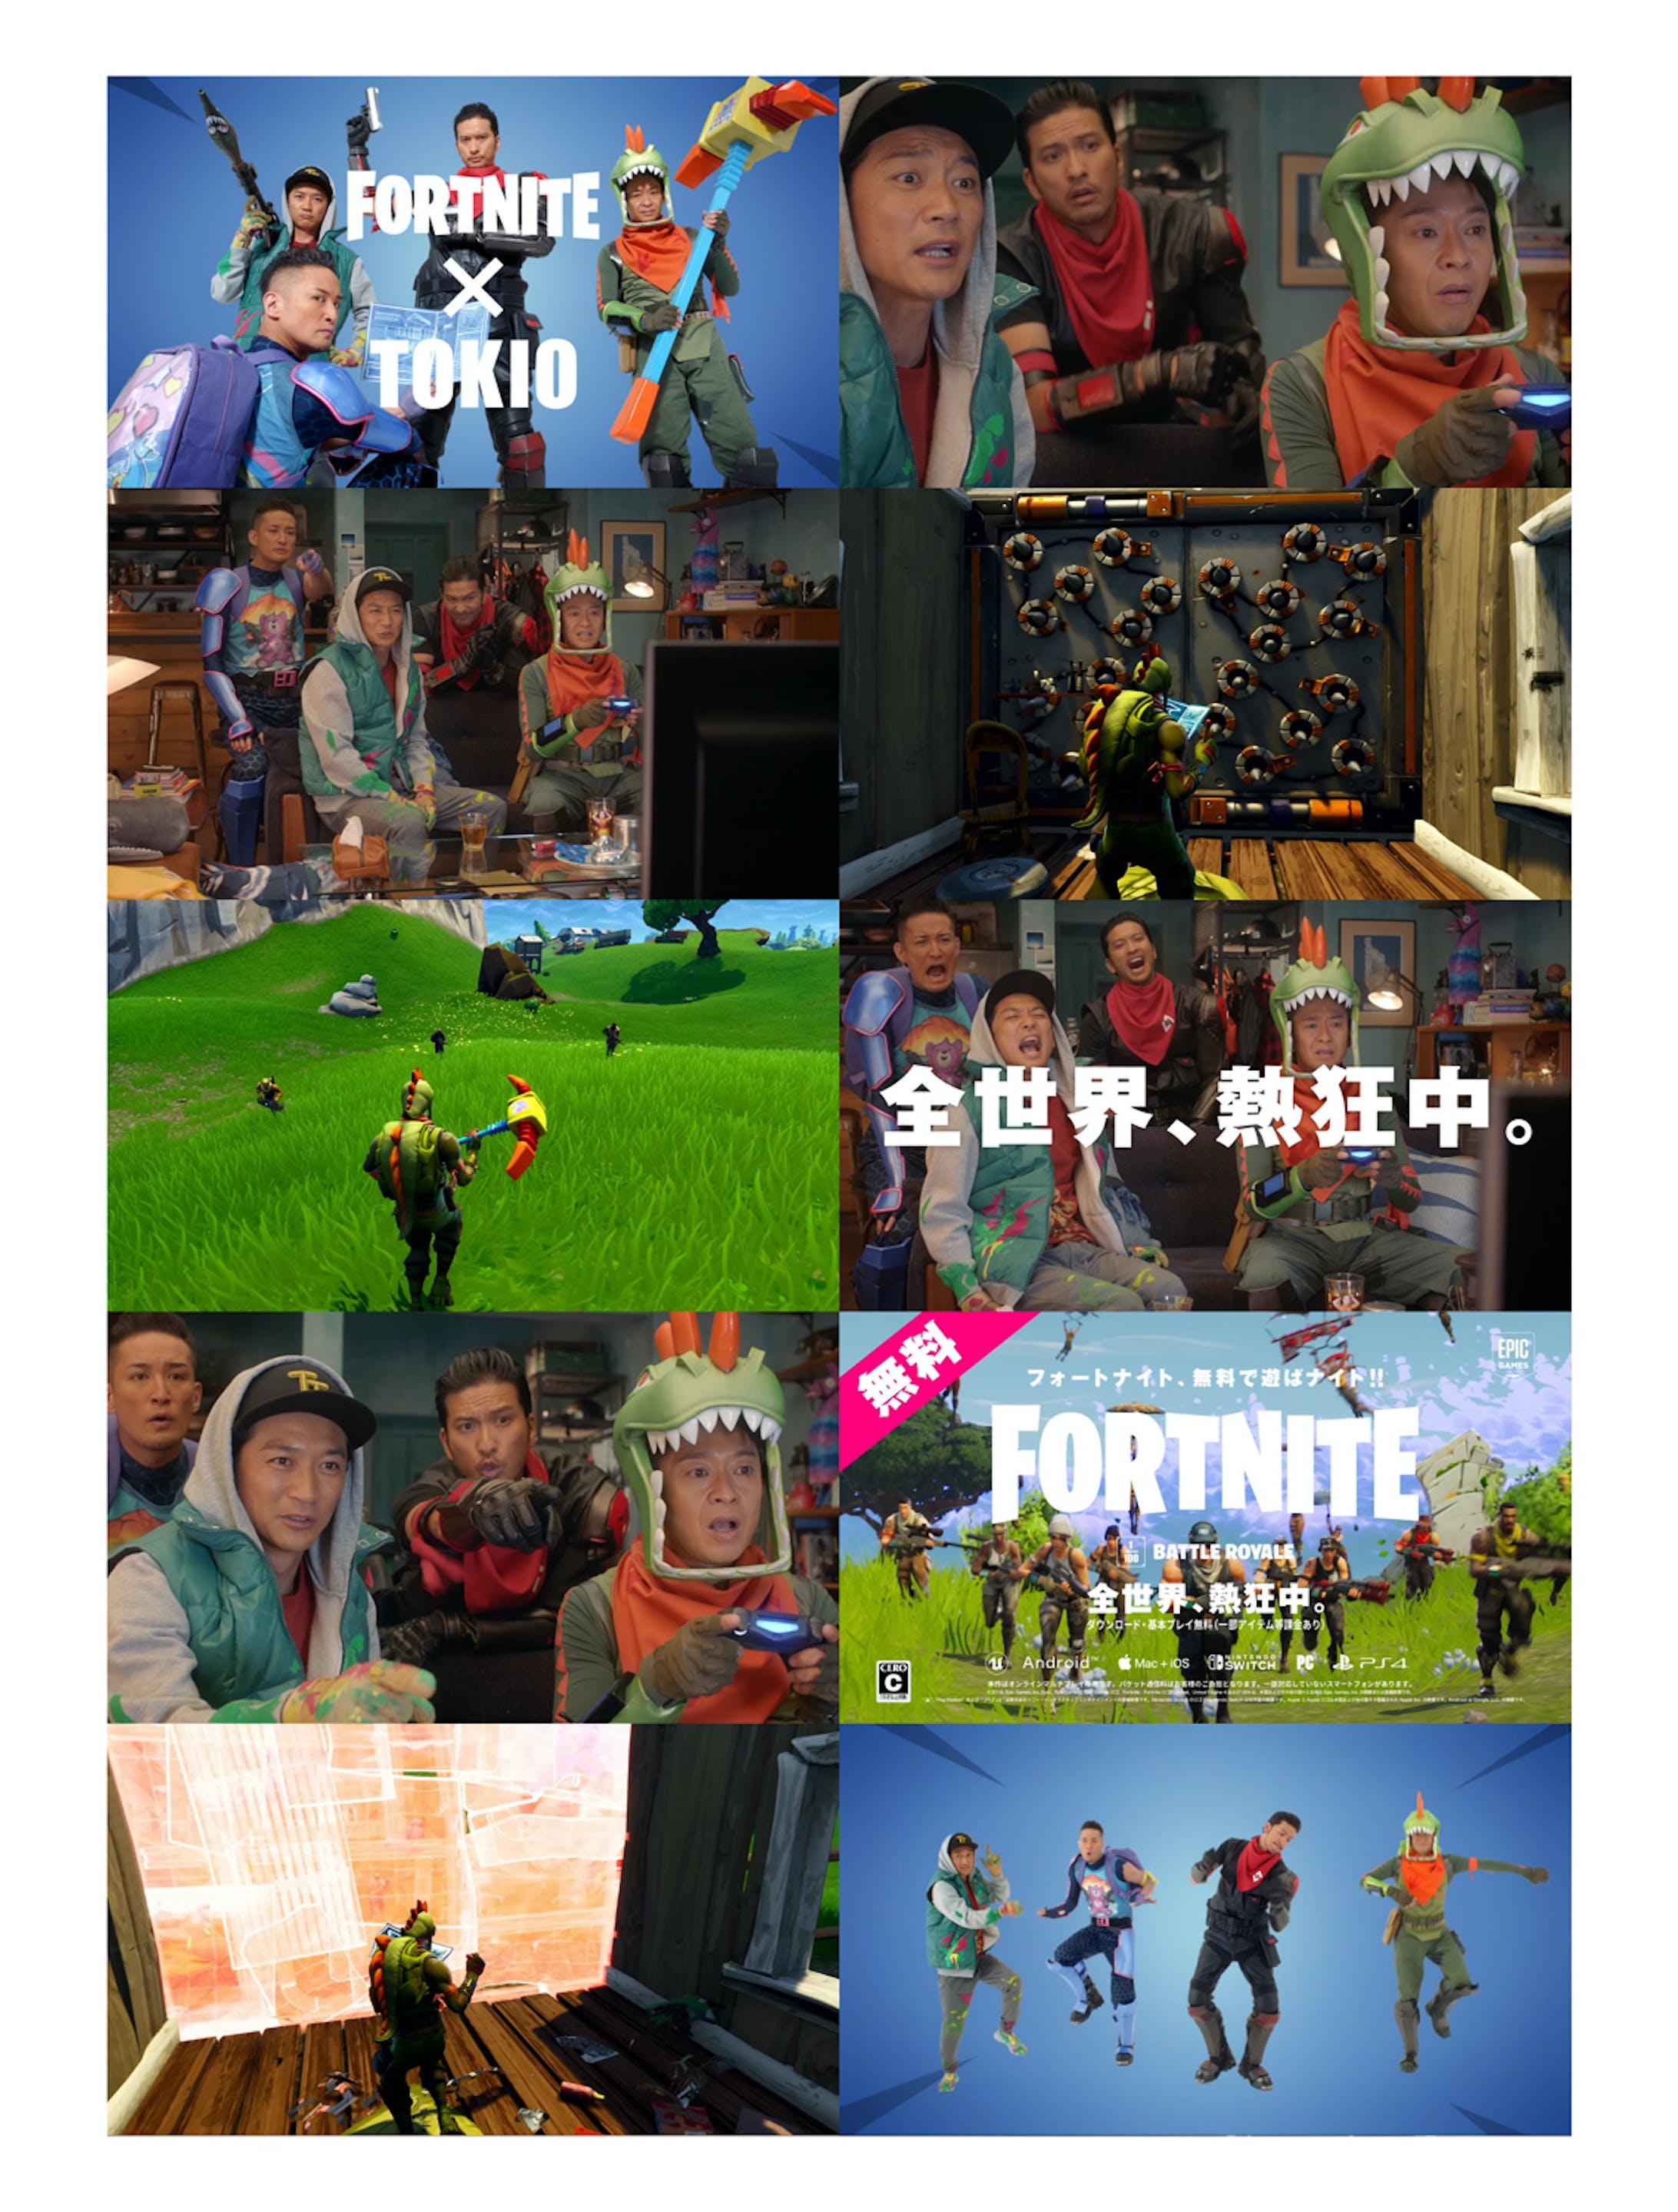 FORTNITE x TOKIO TVCM-3